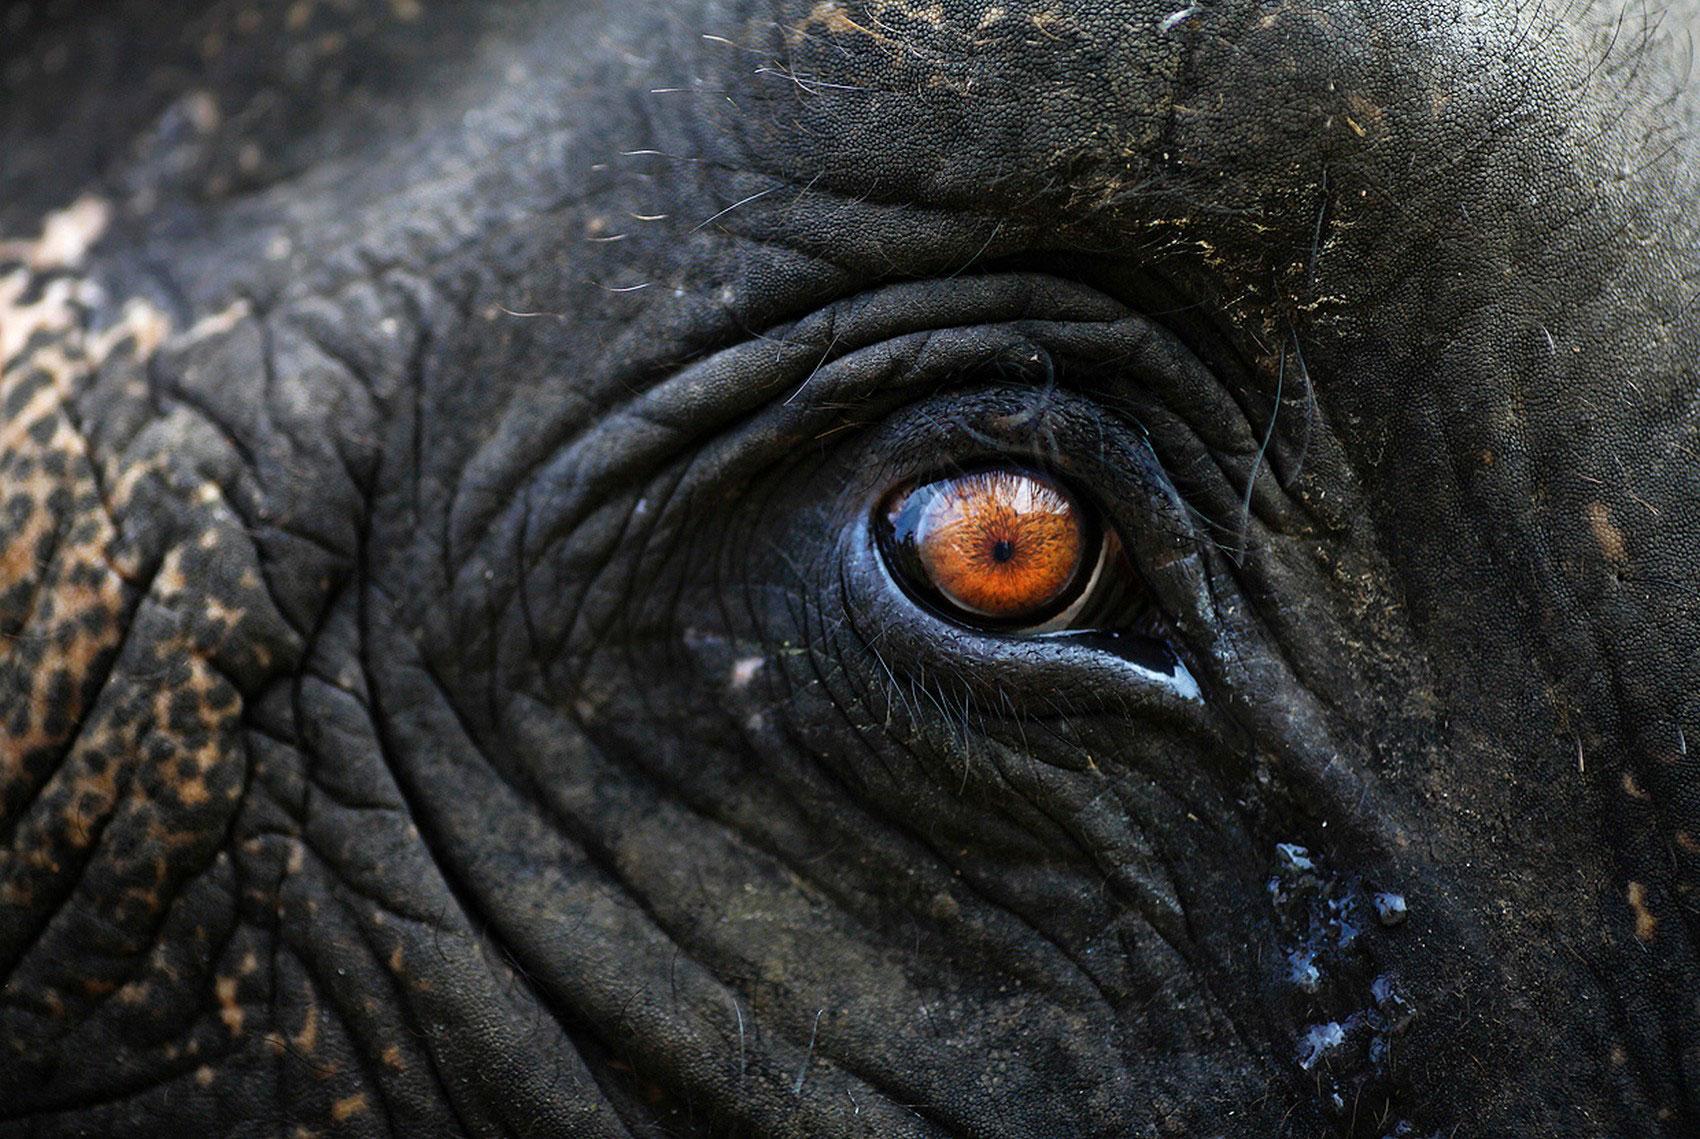 Глаз слона, фото животного мира